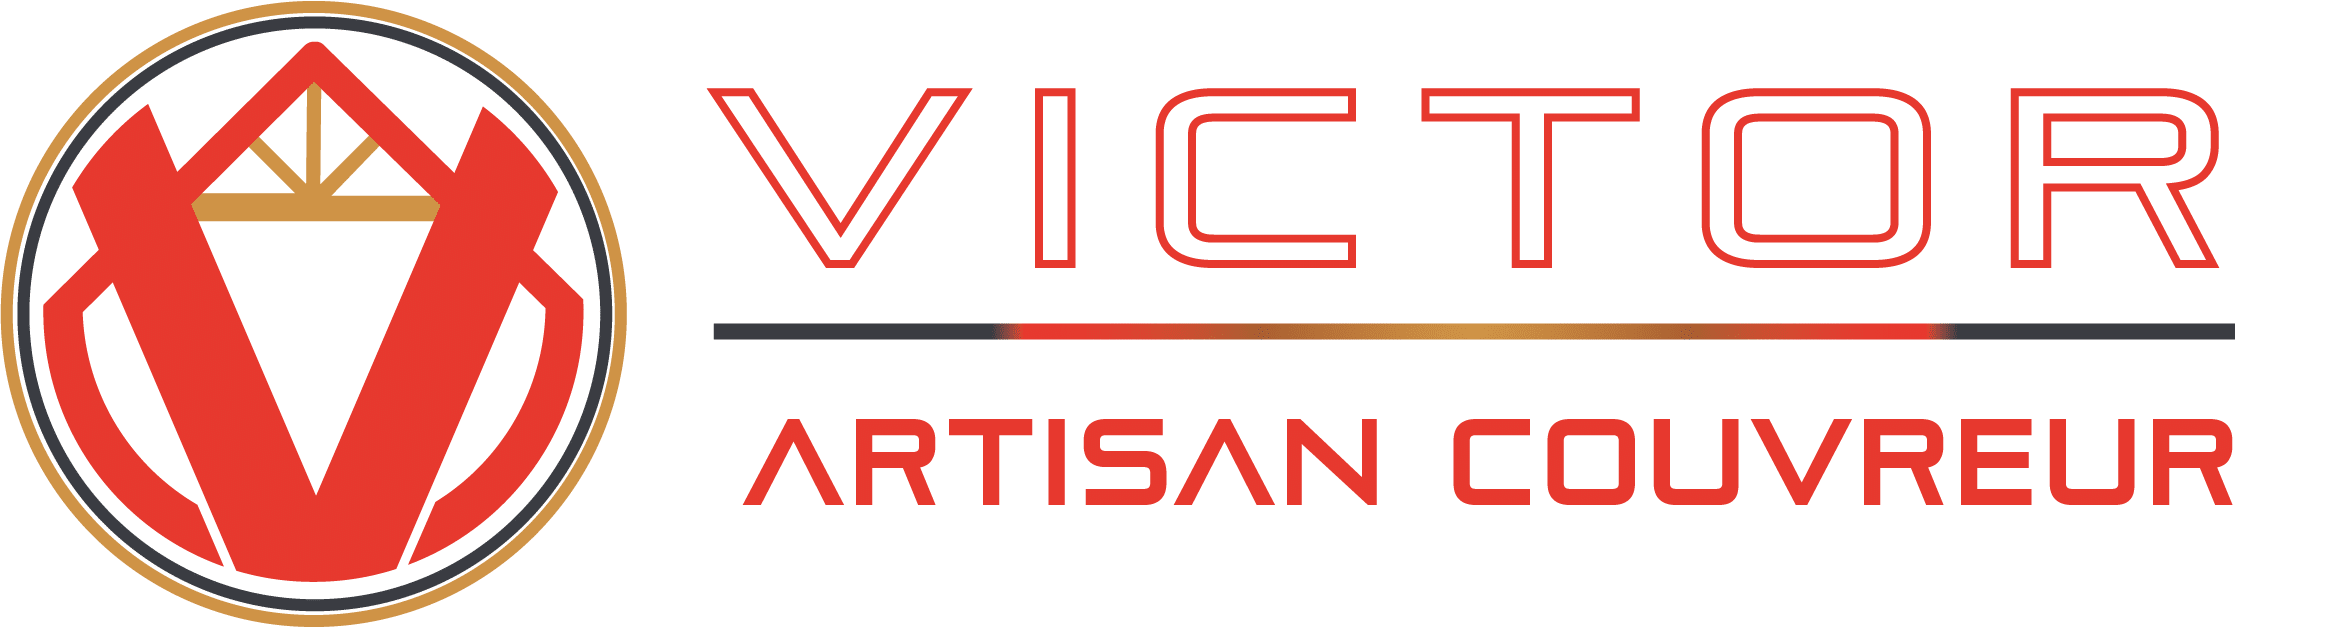 Victor artisan couvreur var